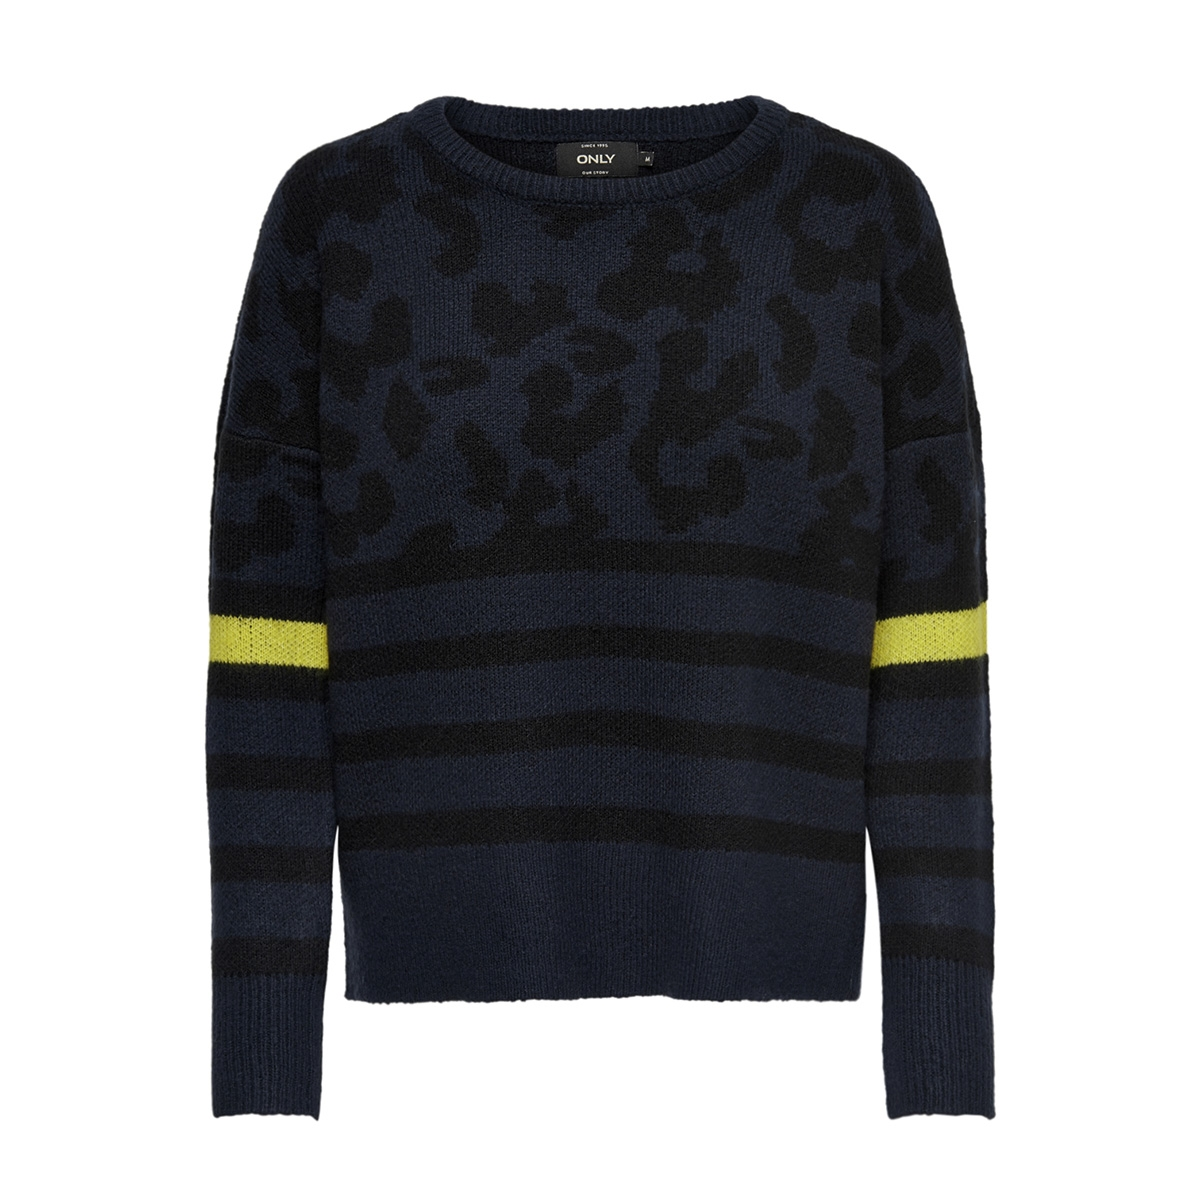 onlnew odine l/s pullover knt 15165578 only trui night sky/ w.black/l